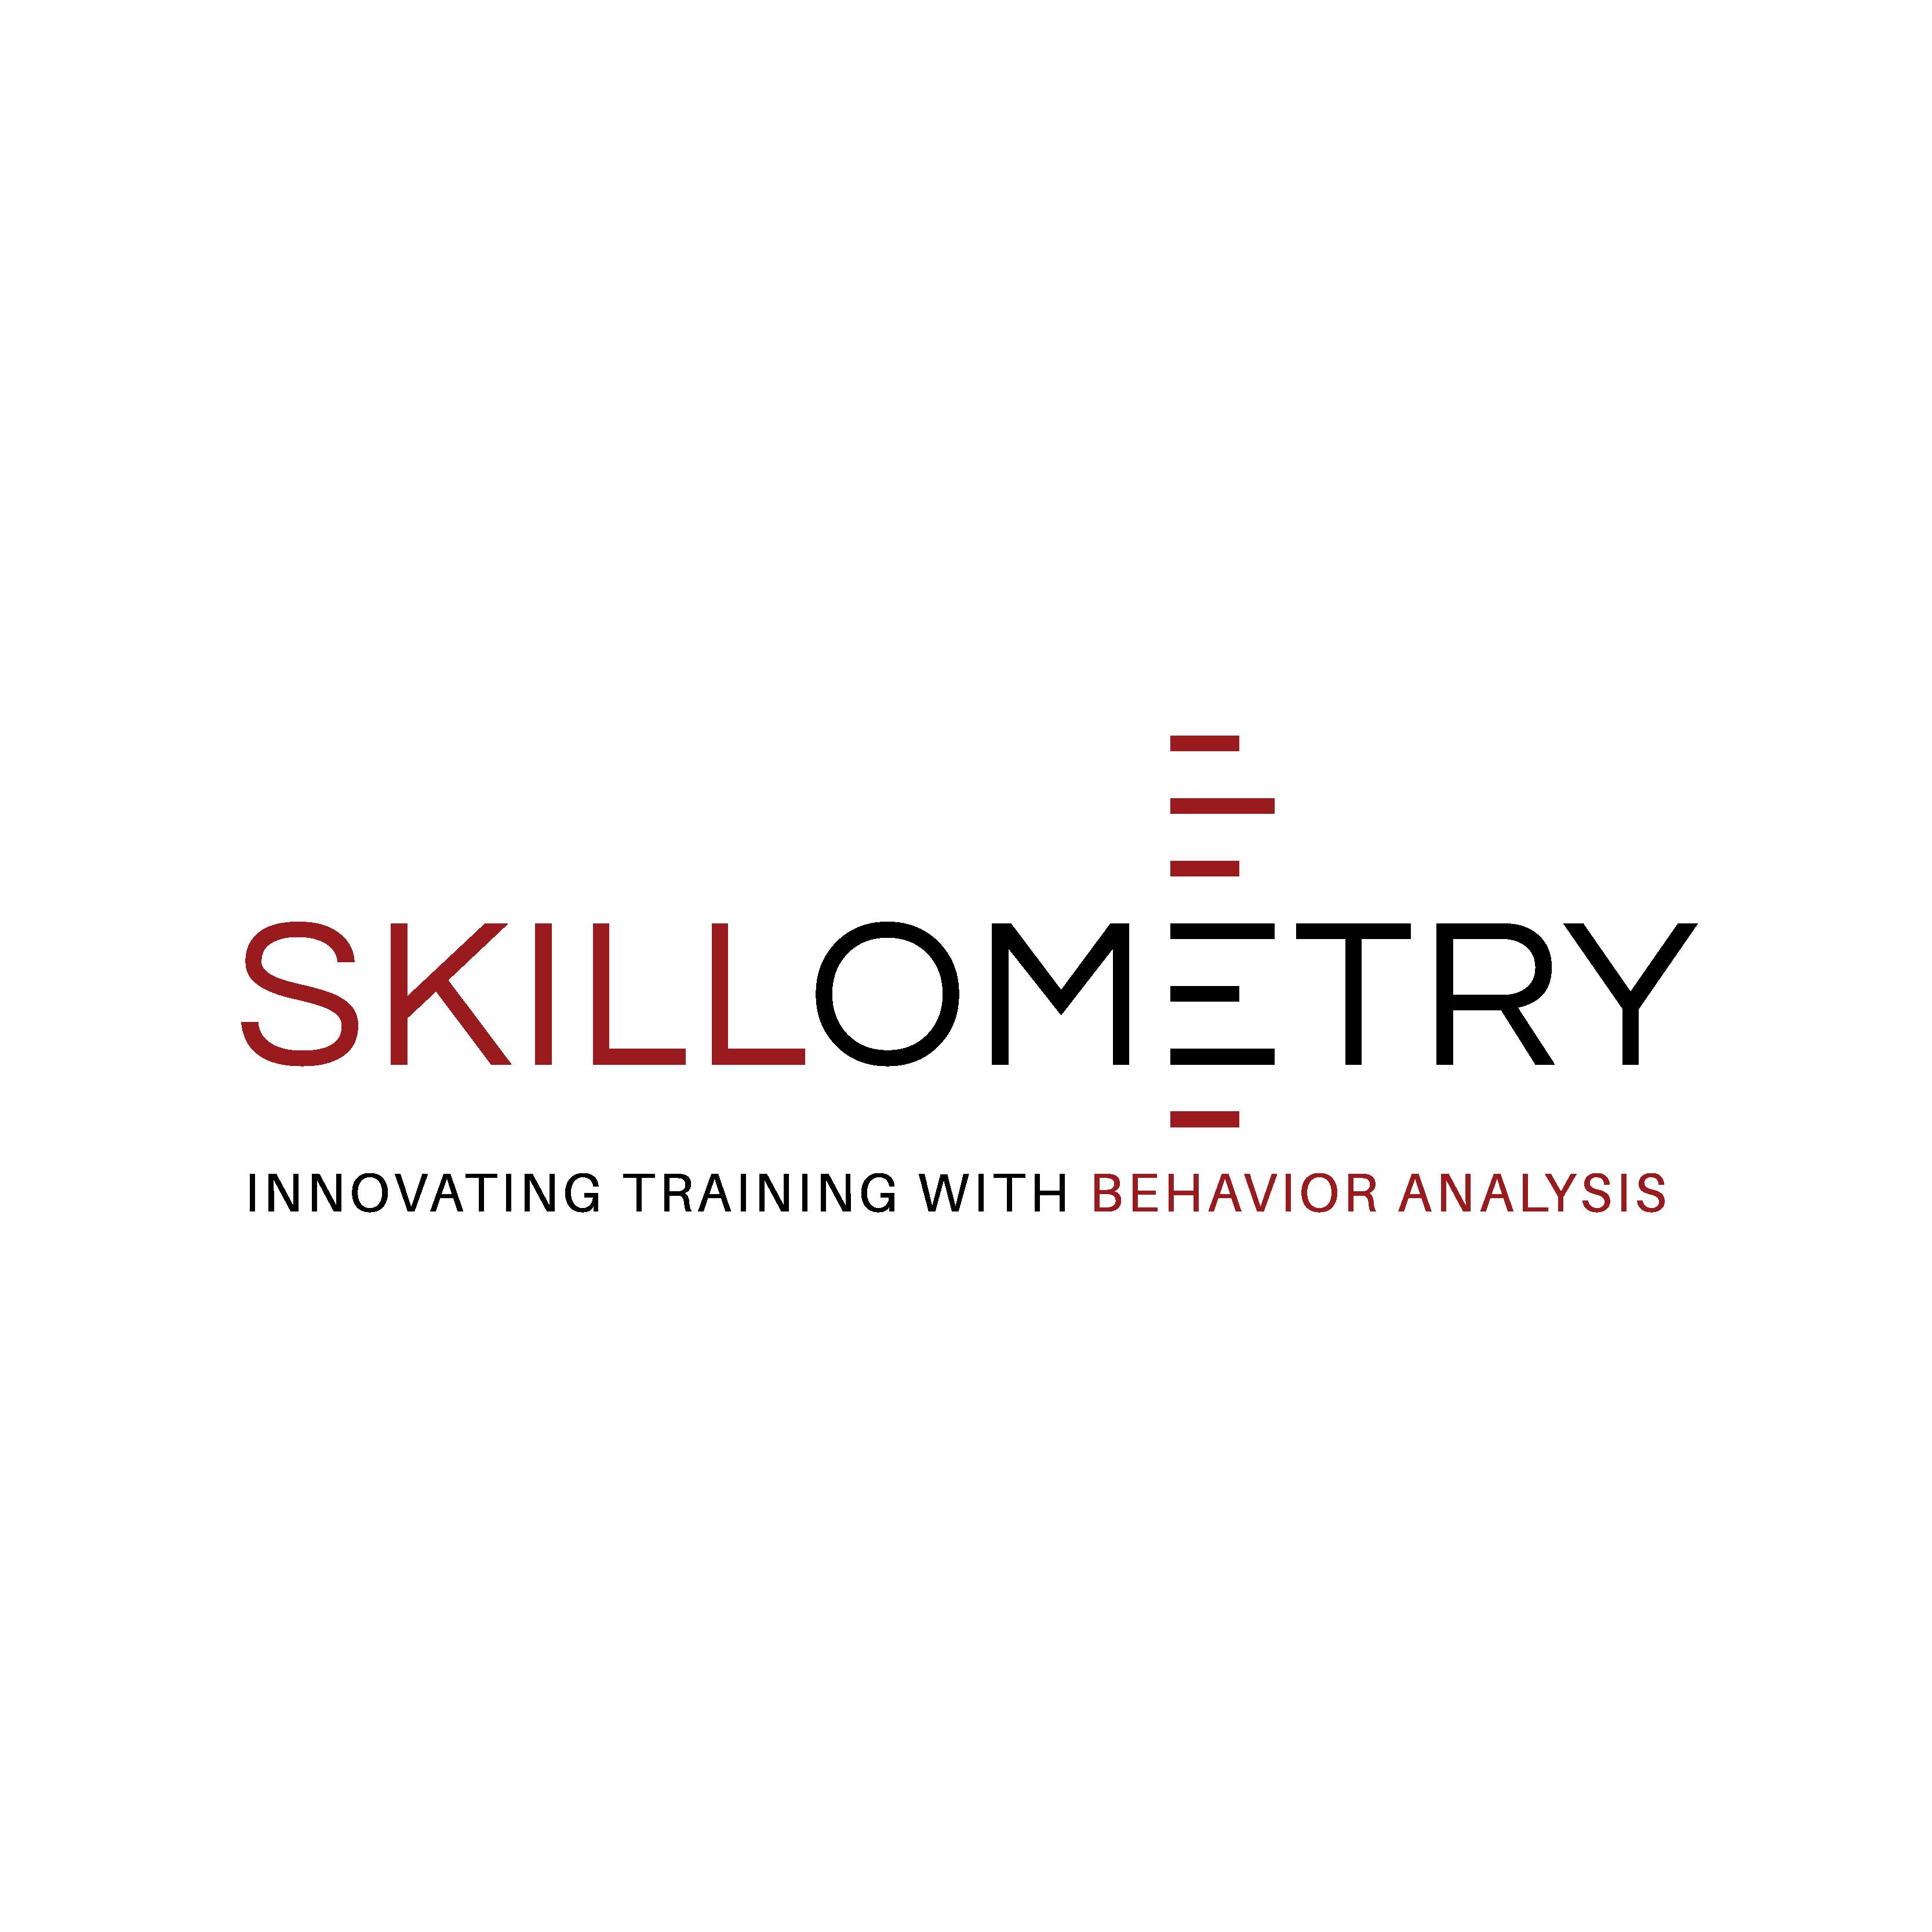 Skillometry